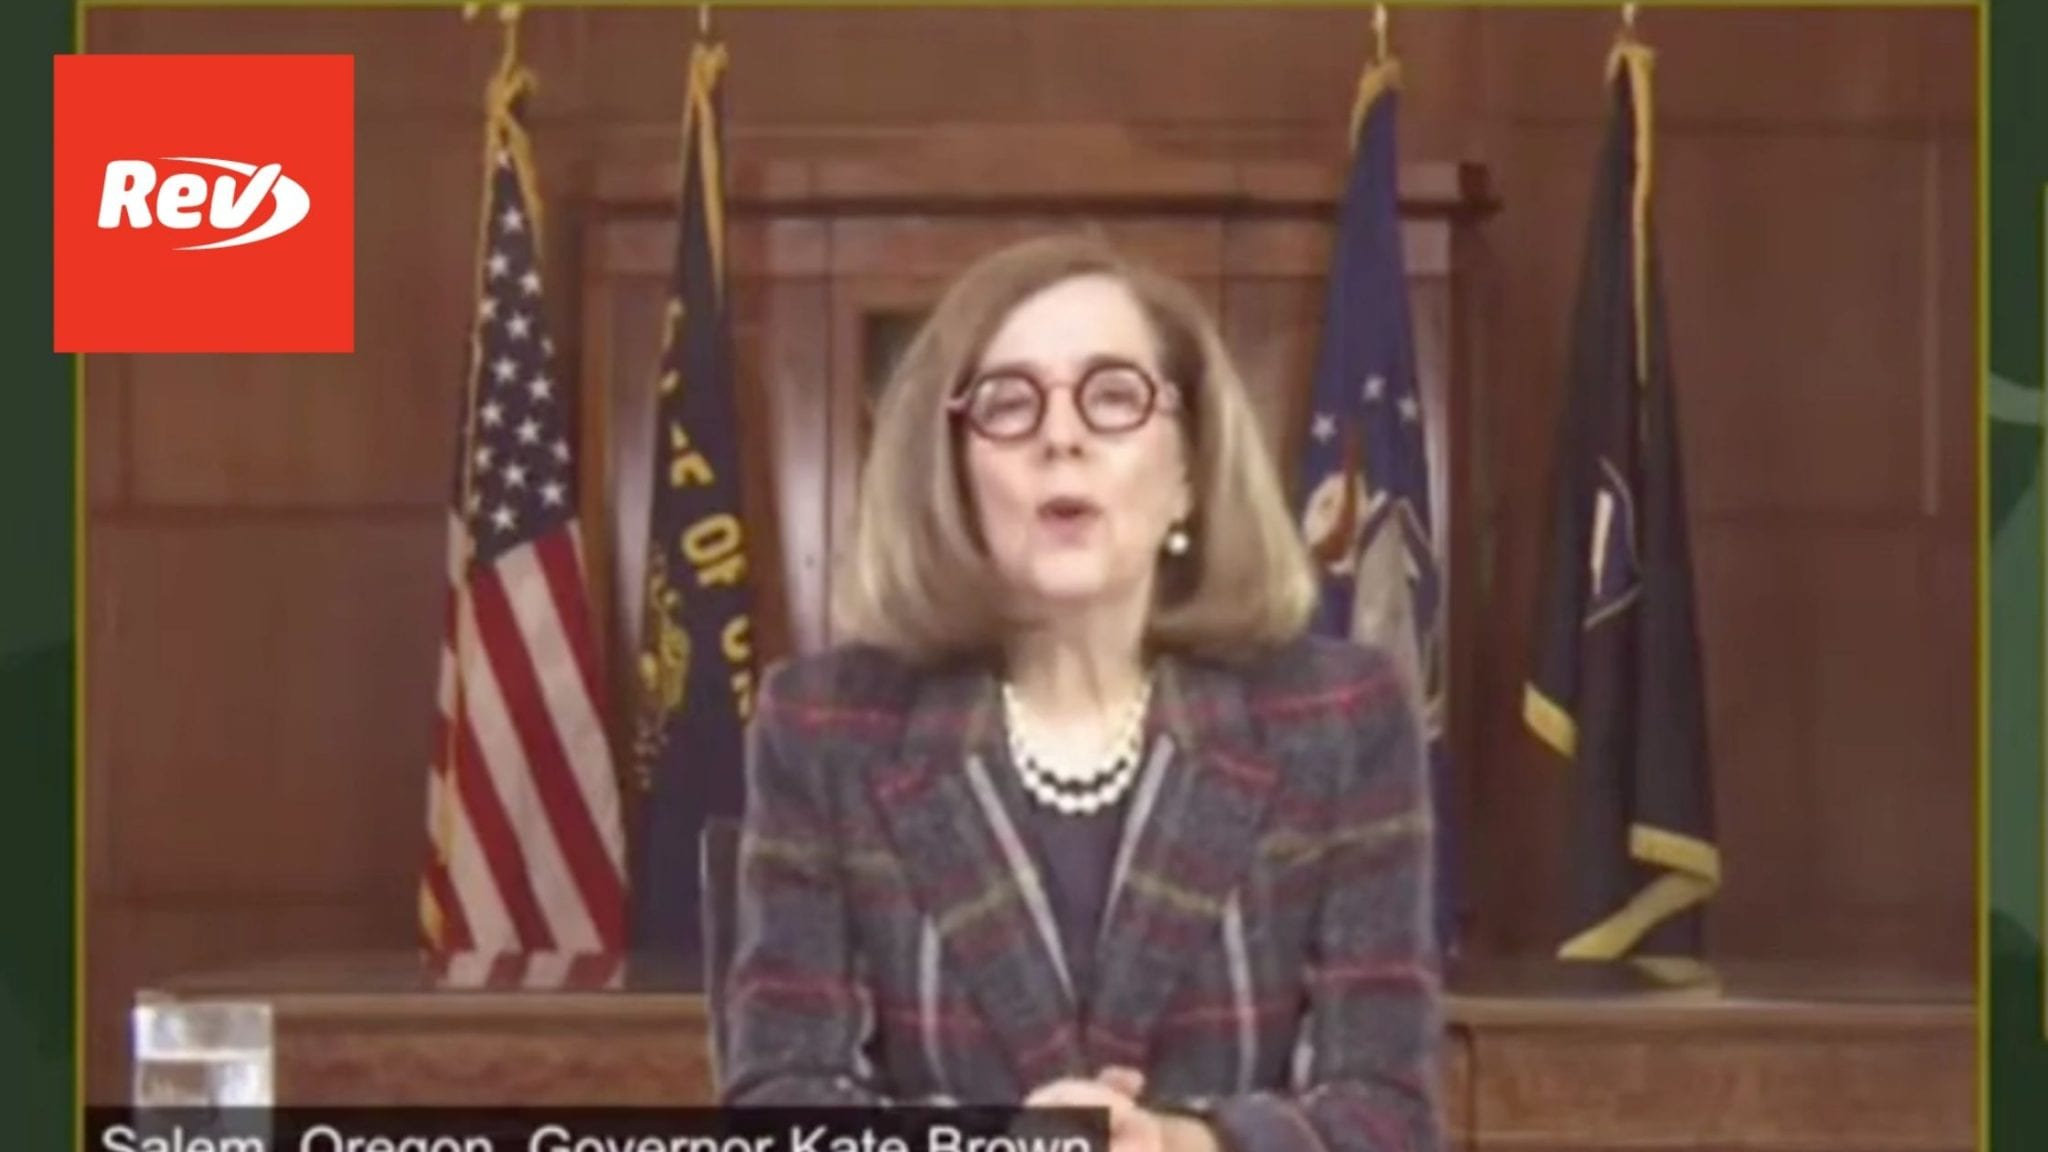 Oregon Governor Kate Brown COVID-19 Press Conference Transcript May 11